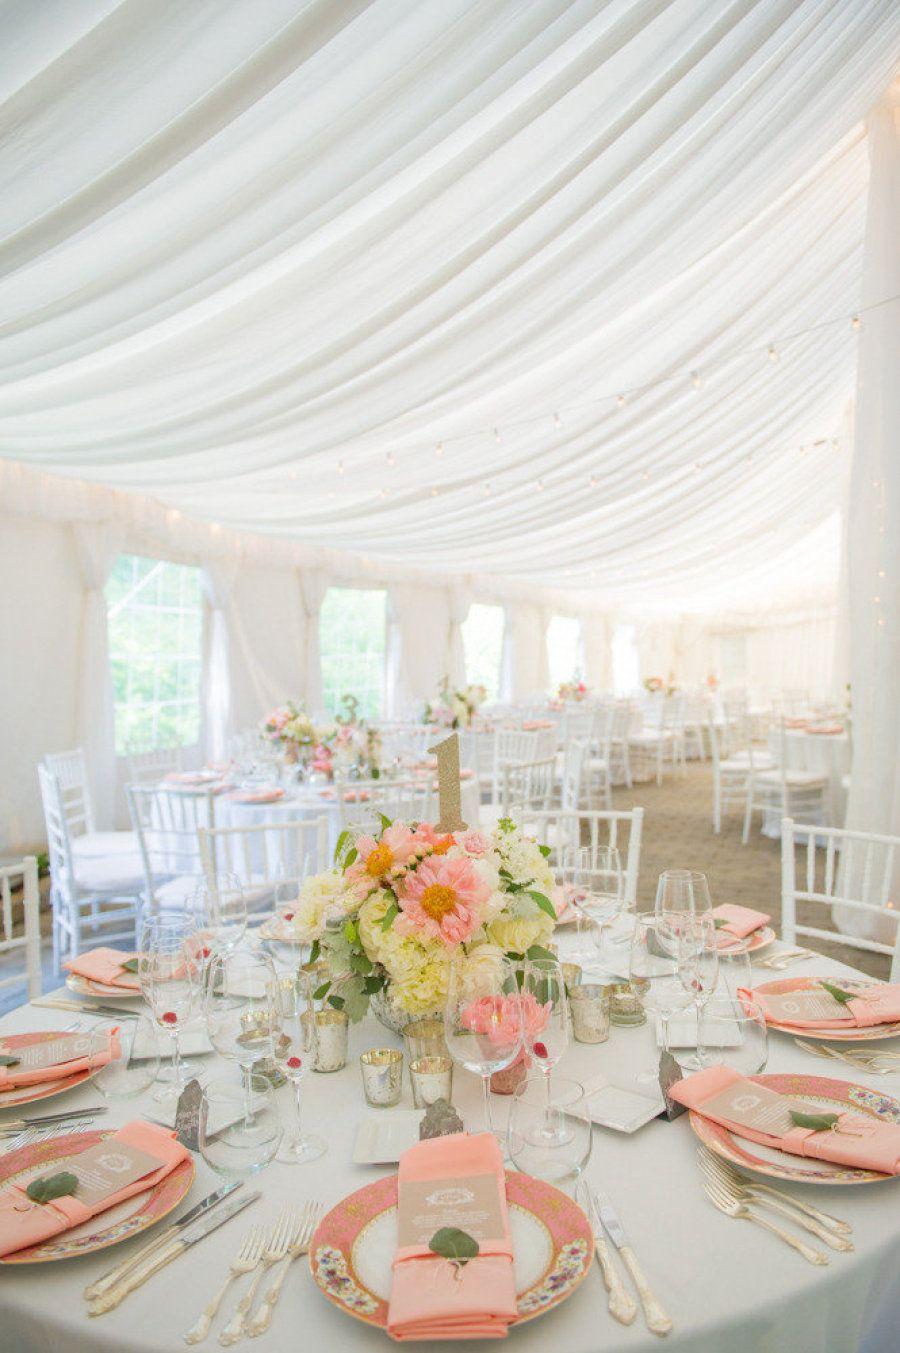 Baltimore Wedding from L Hewitt Photography | Baltimore wedding ...